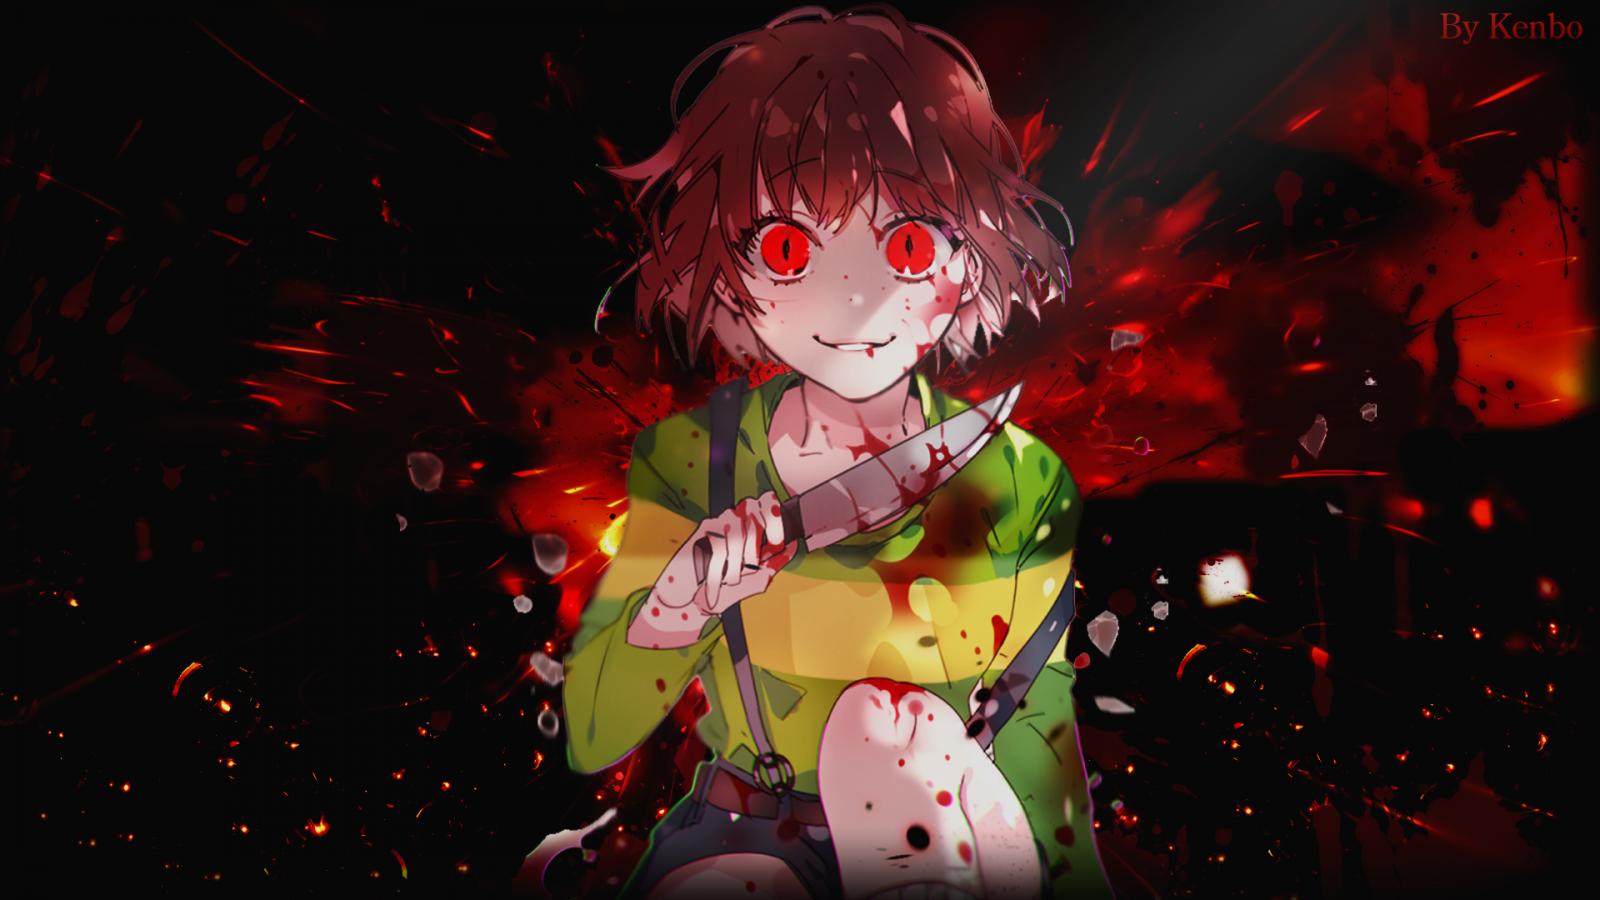 Wallpaper : yandere, anime girls, manga, Anime Game, blood ...